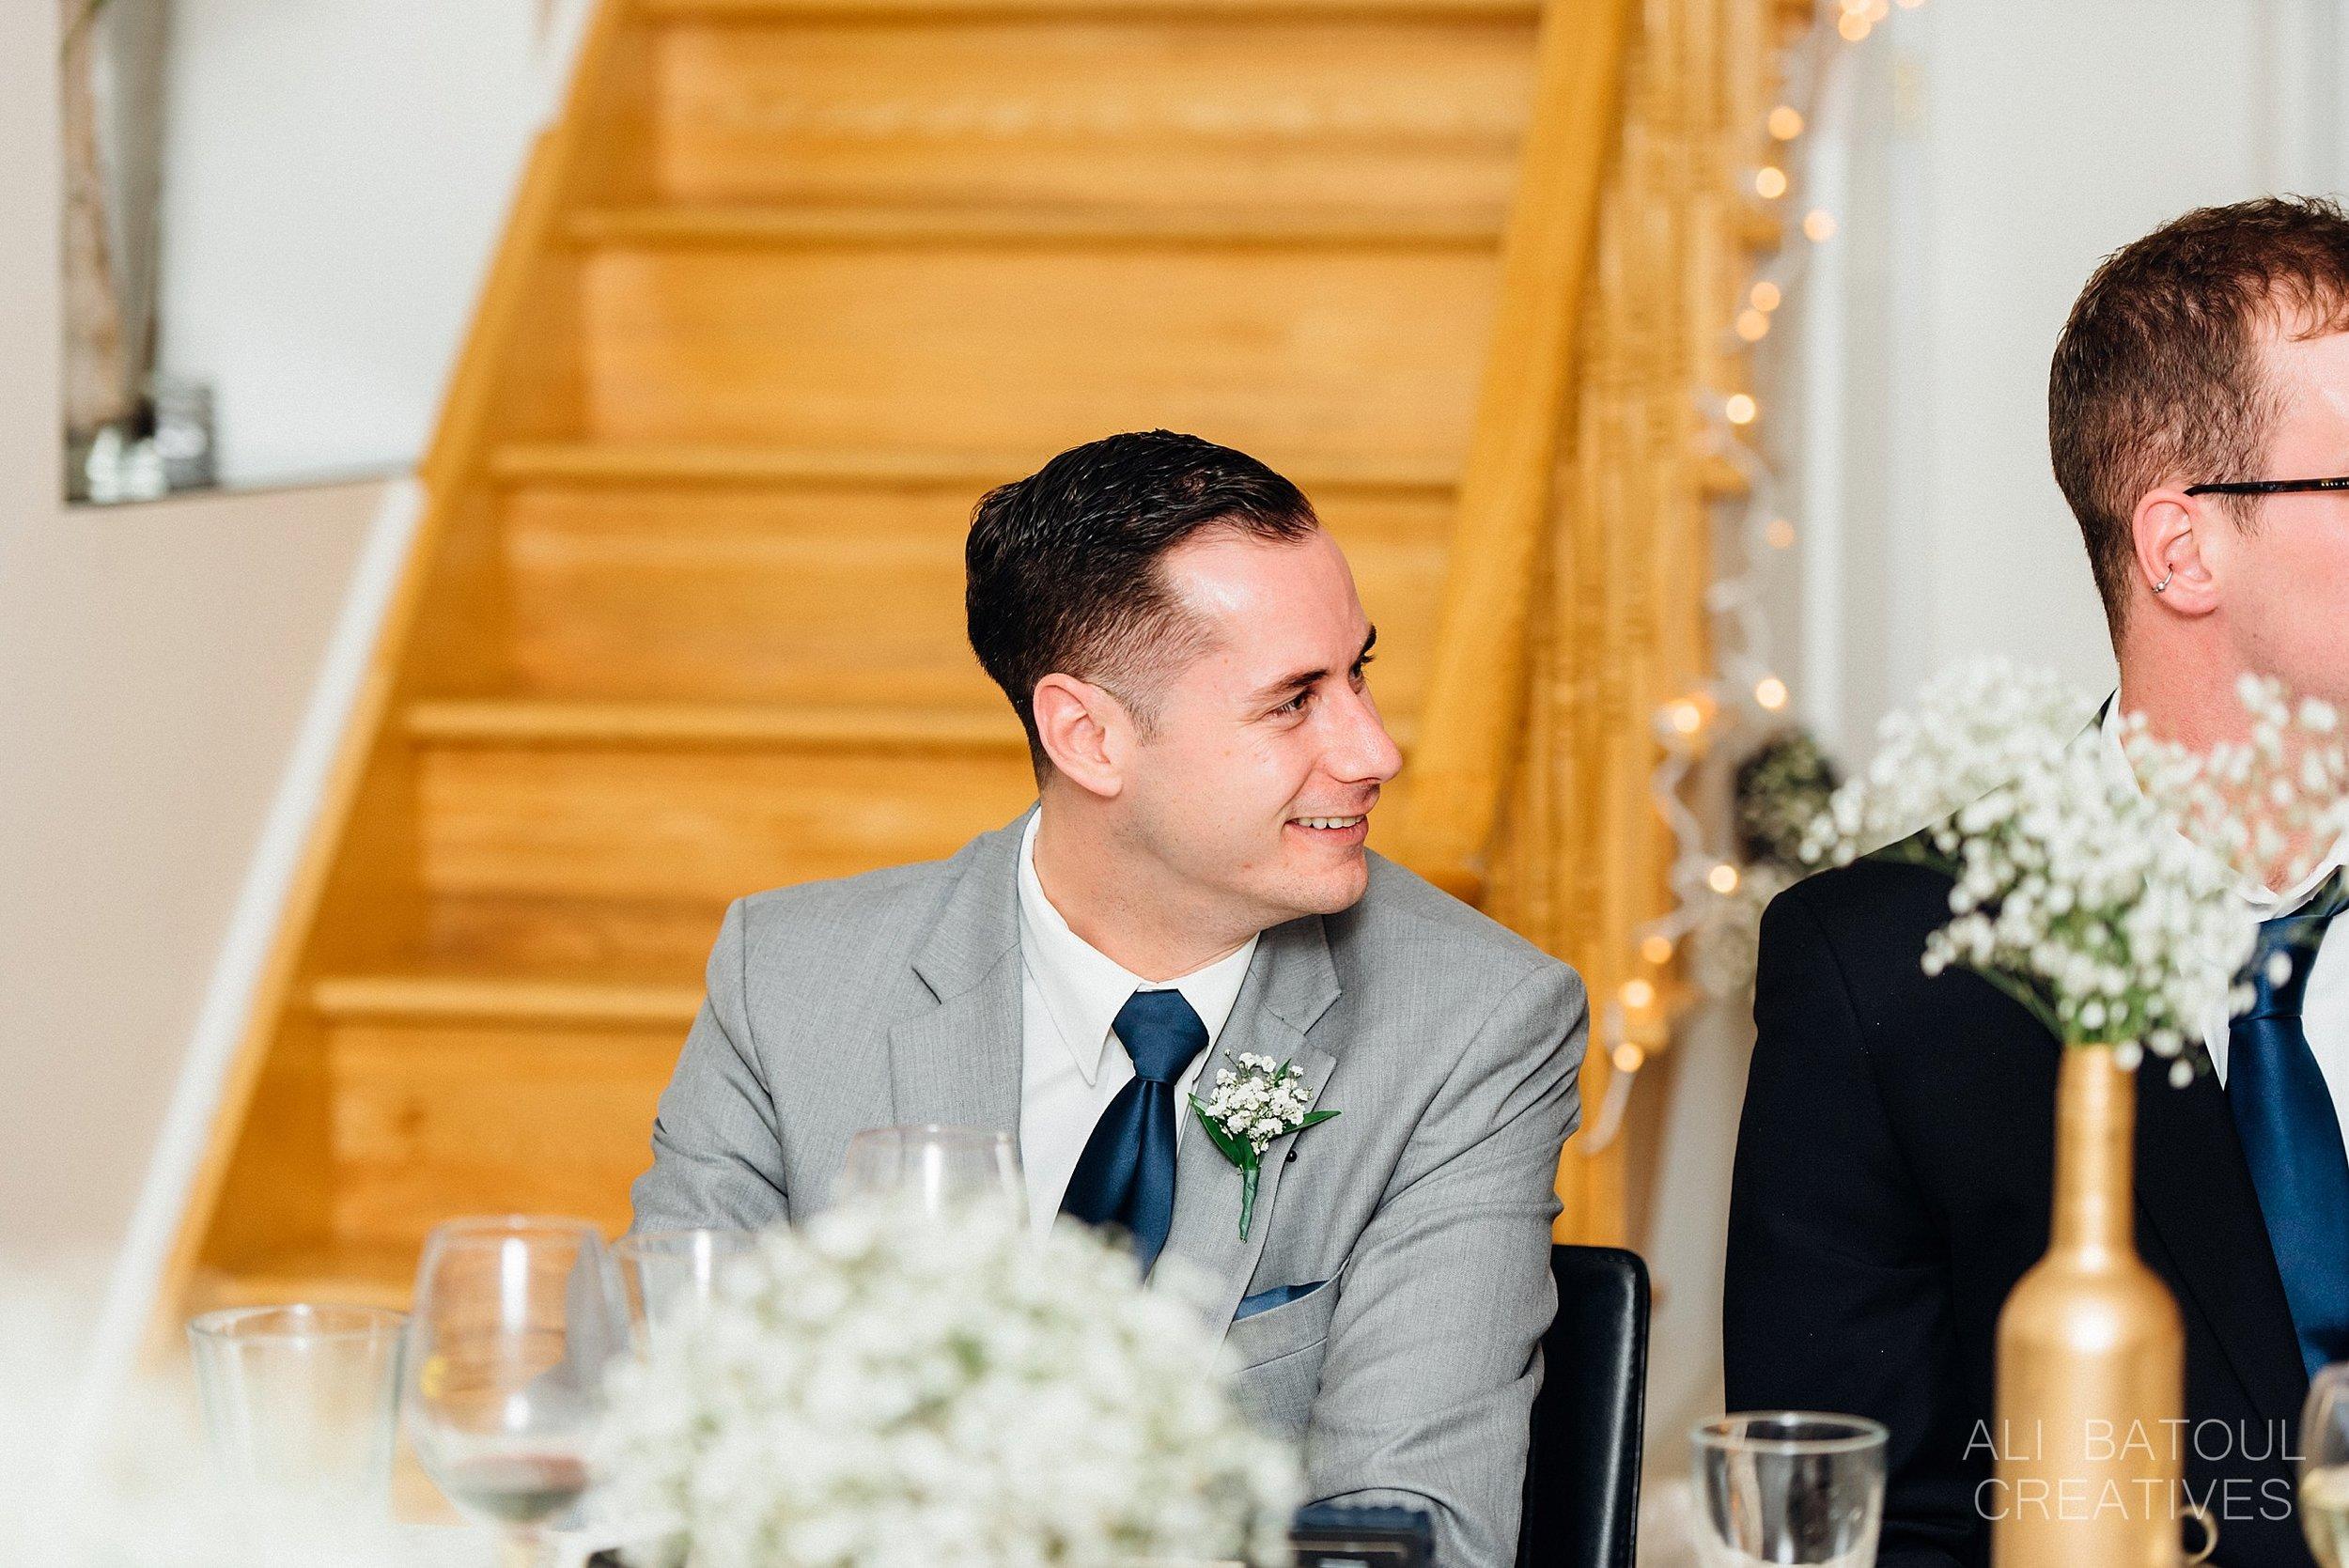 Jocelyn + Steve At The Schoolhouse Wedding - Ali and Batoul Fine Art Wedding Photography_0103.jpg